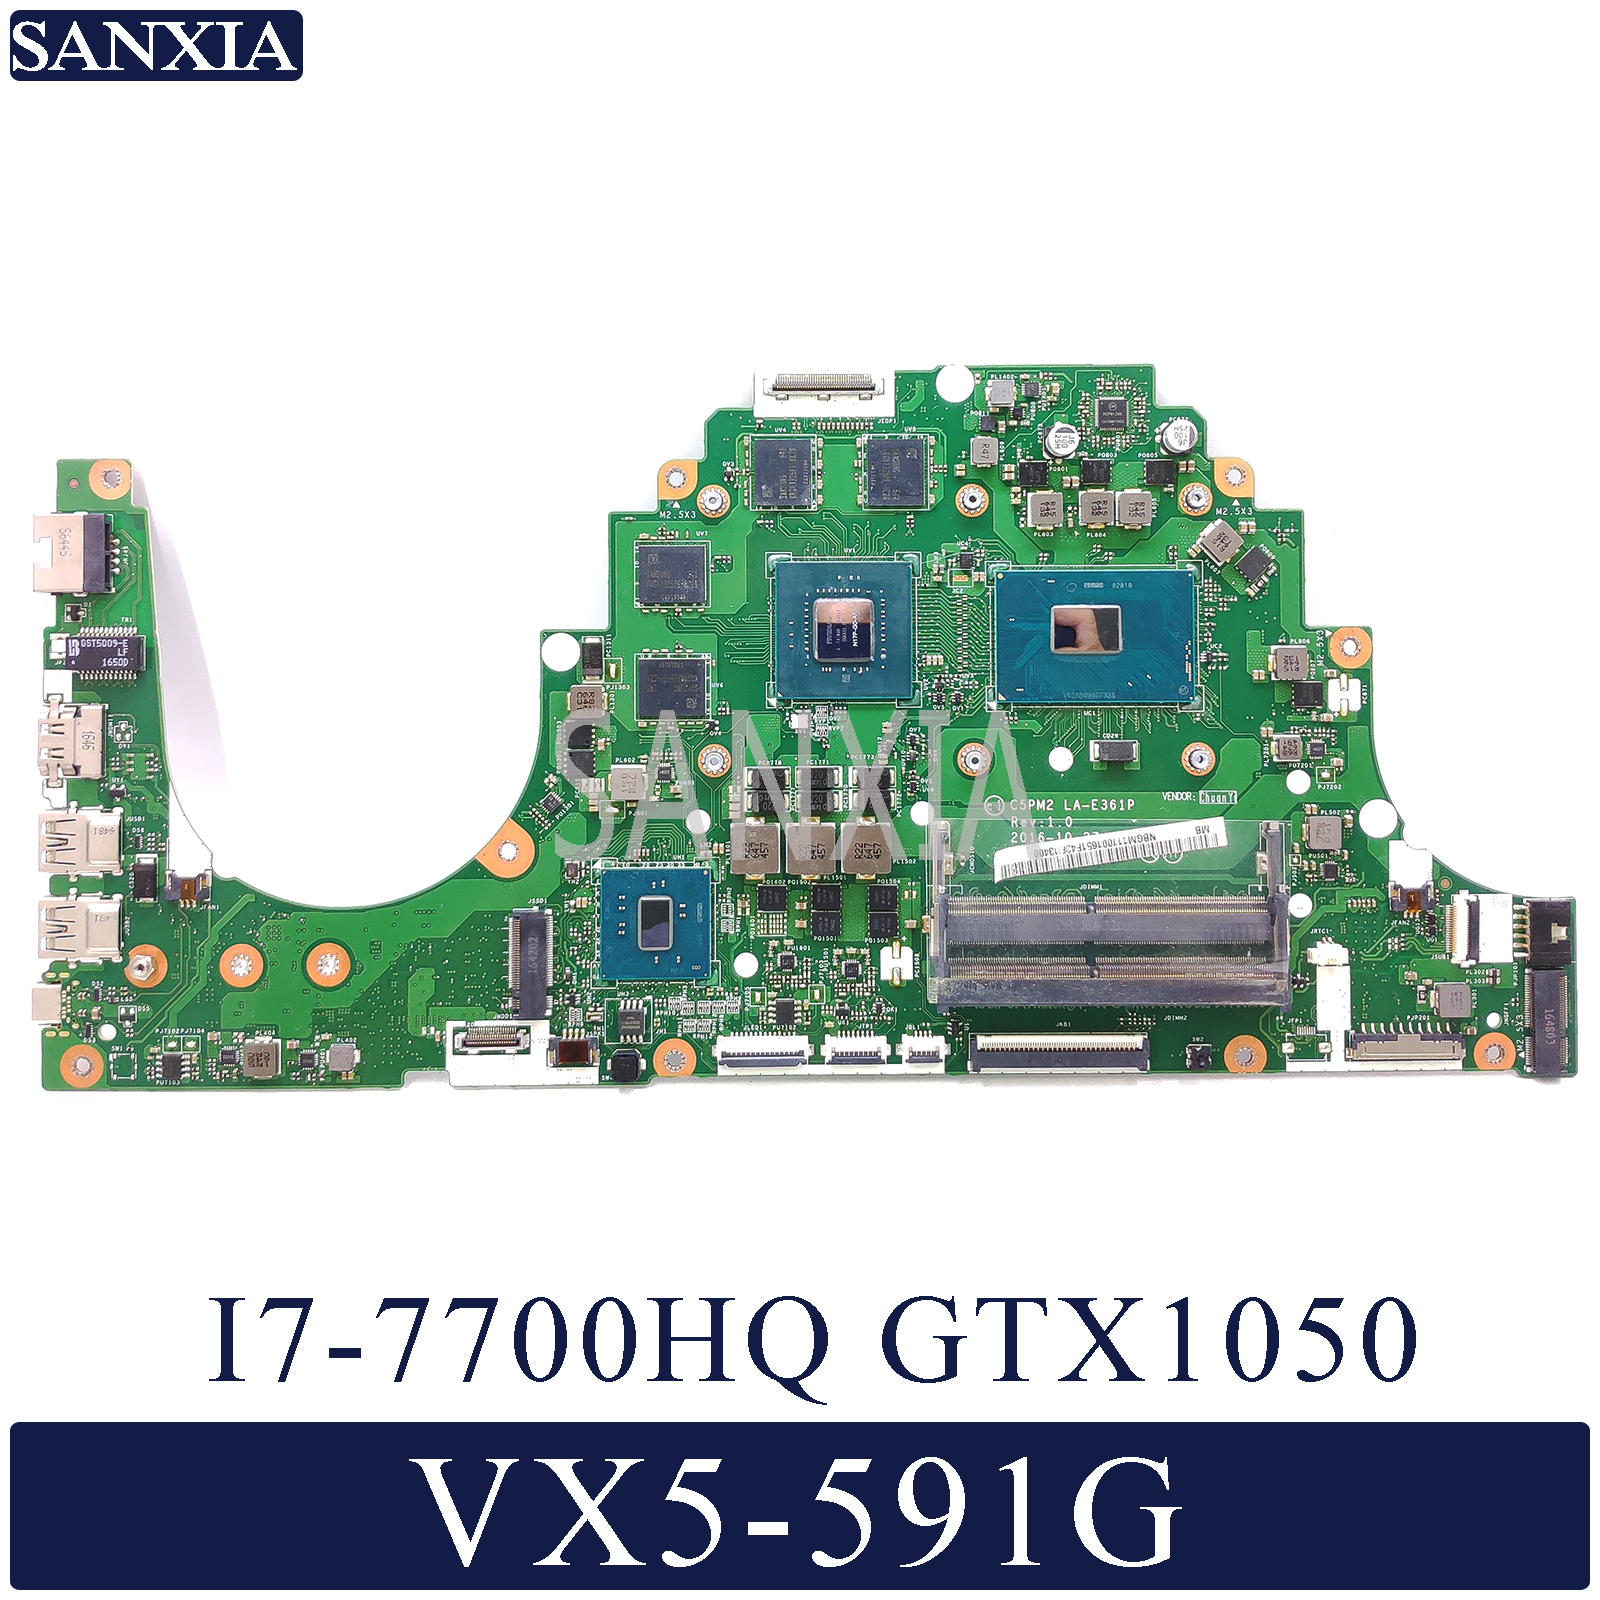 KEFU C5PM2 LA E361P Laptop motherboard for font b Acer b font Aspire VX5 591G original